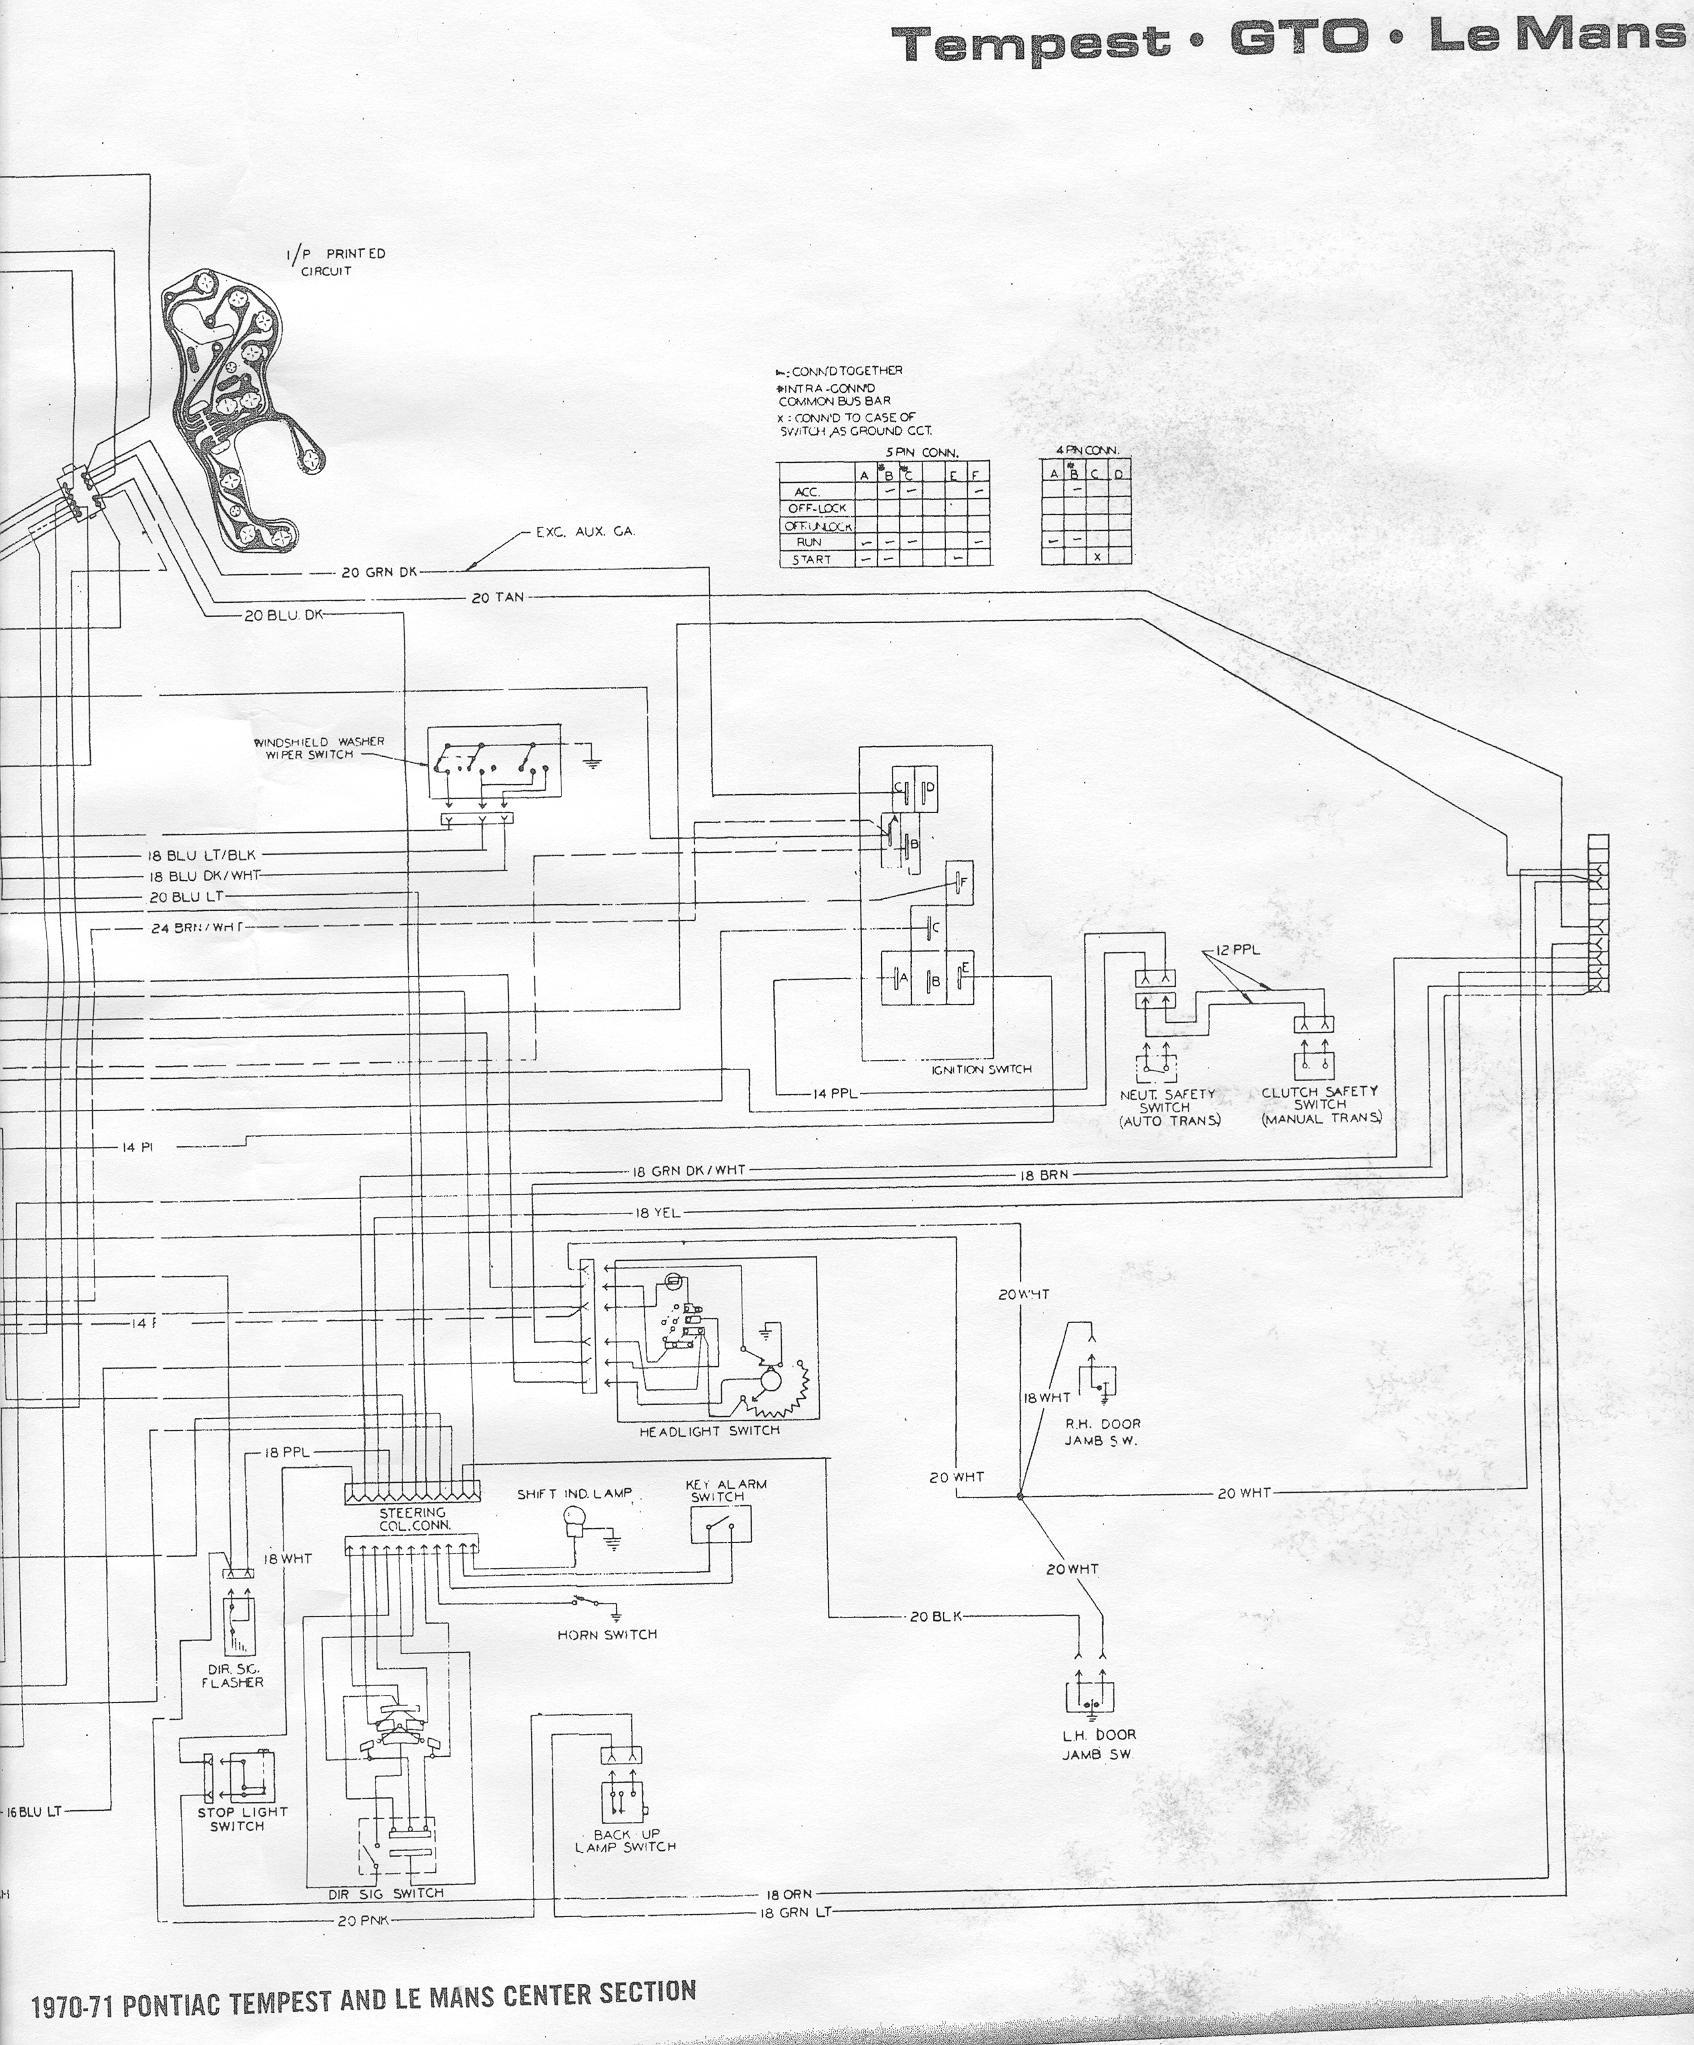 [DIAGRAM] 66 Gto Wiring Diagram Schematic FULL Version HD